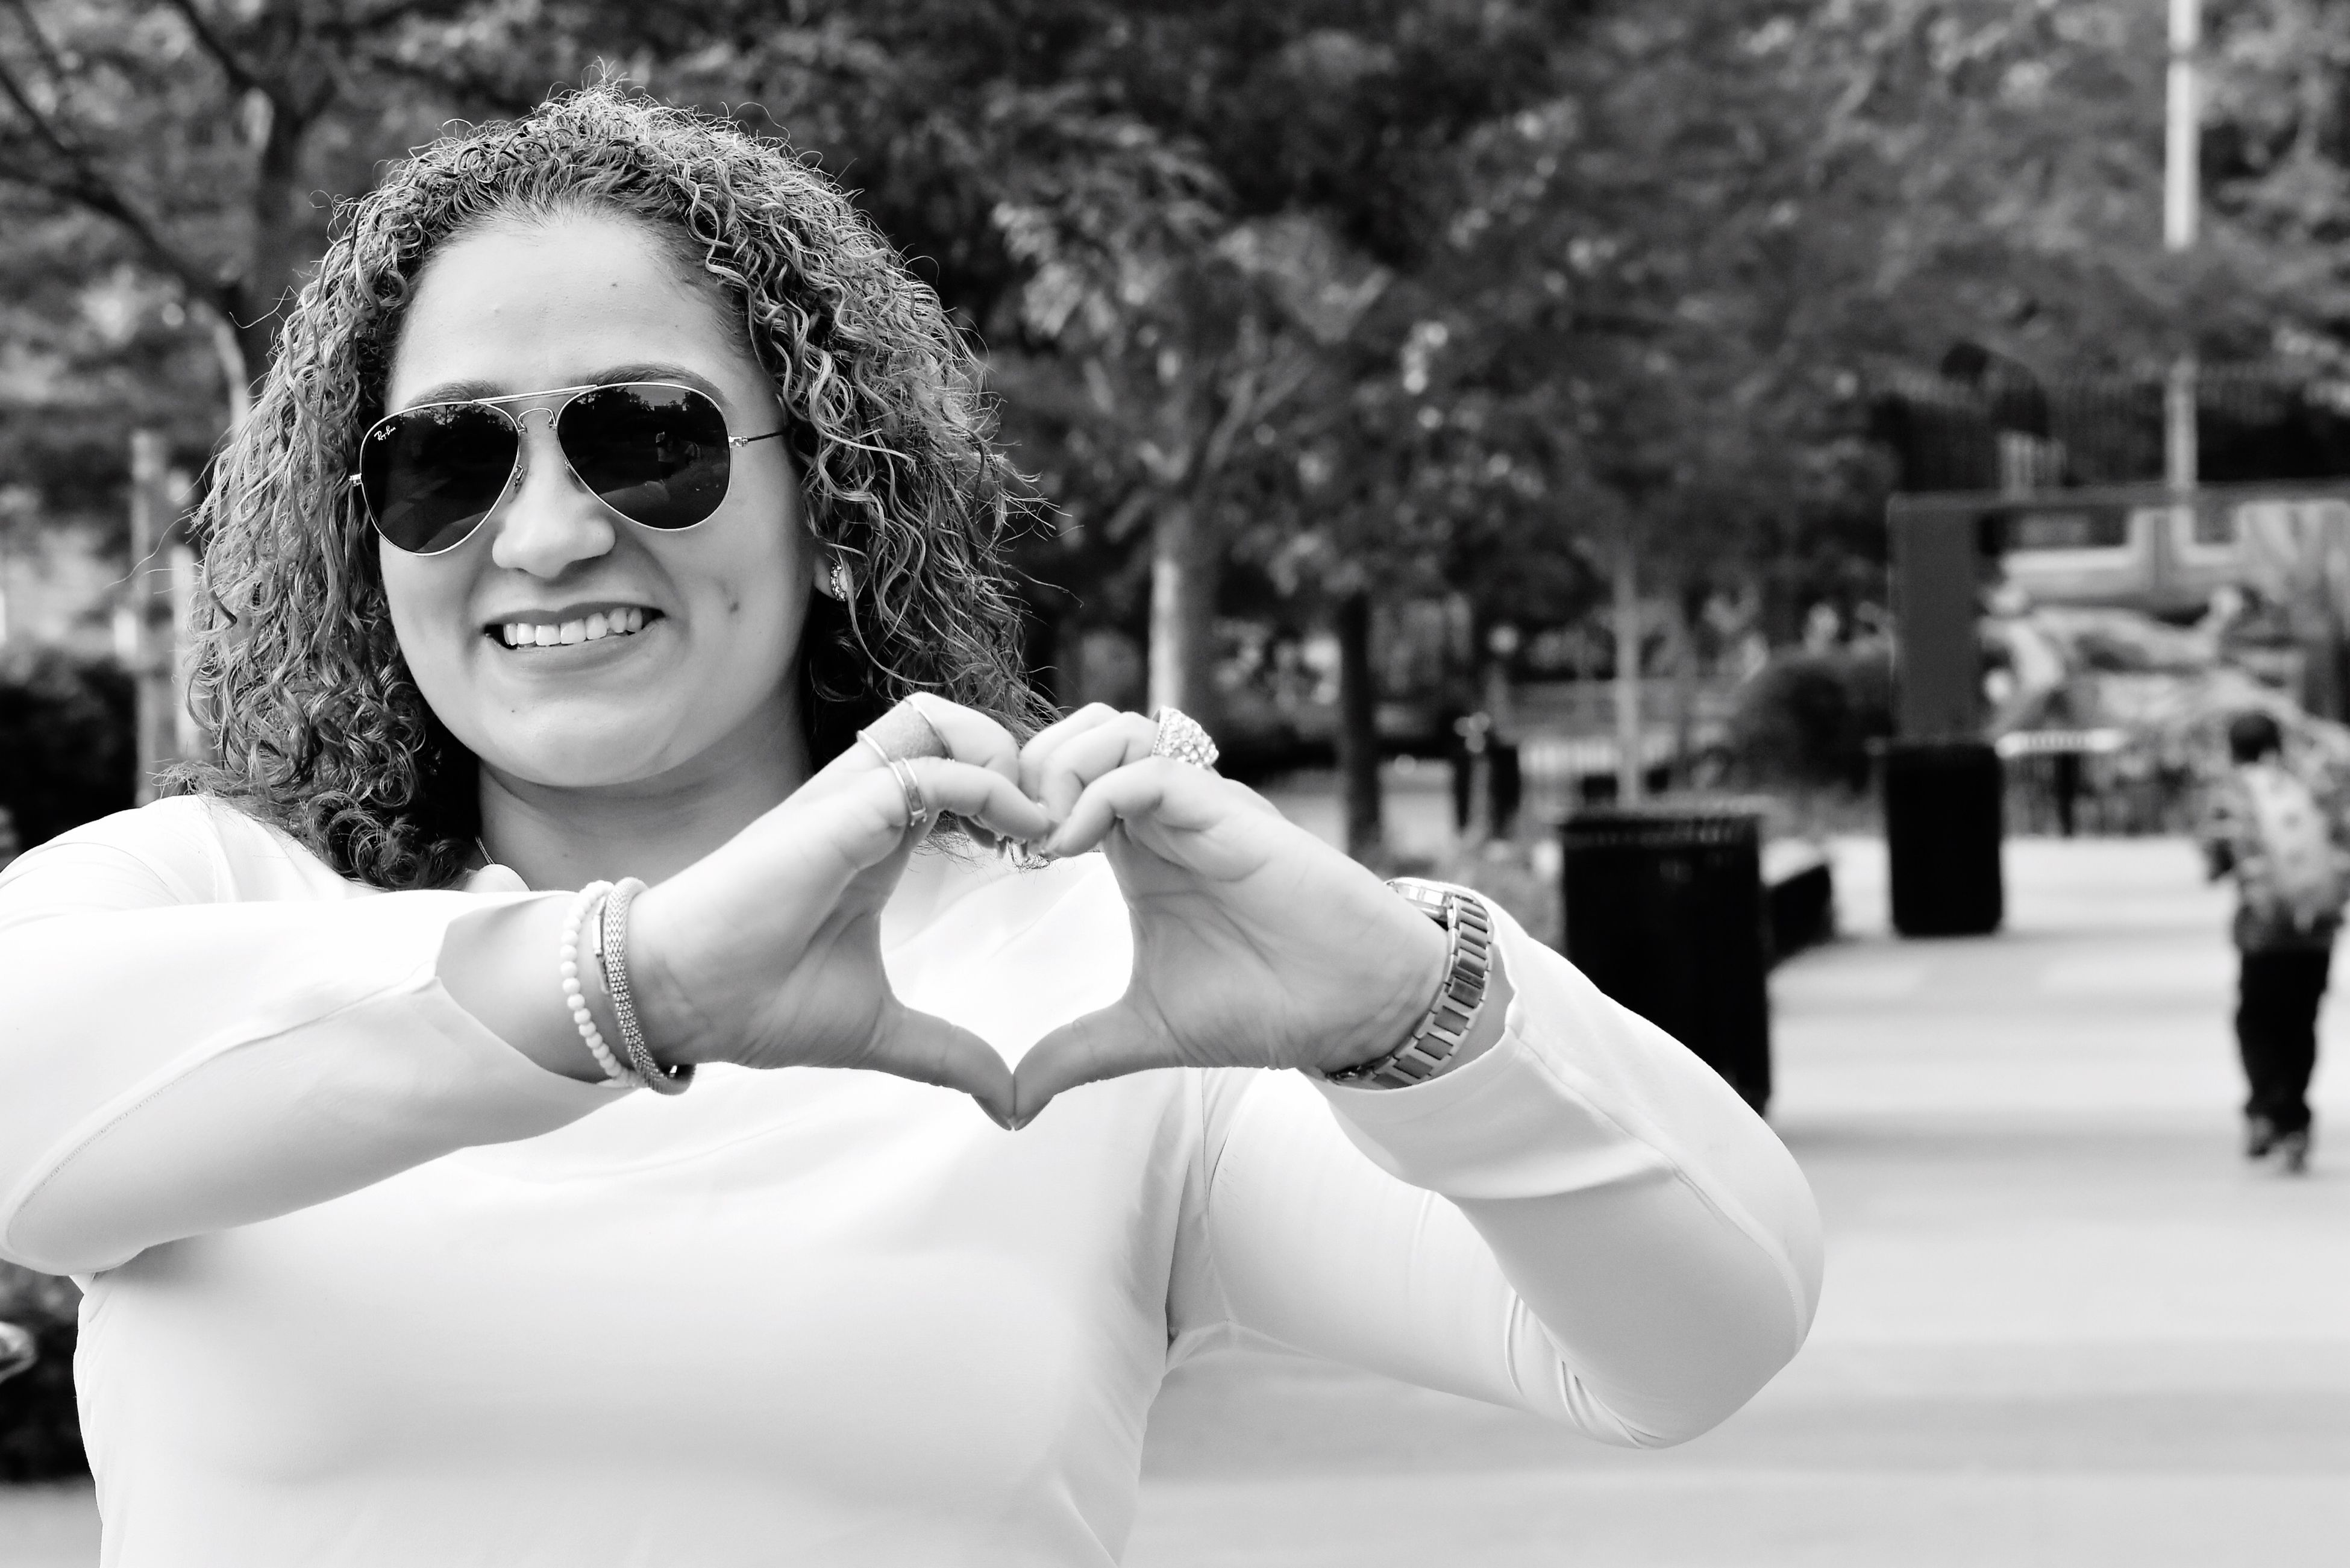 EyeEm Coruna BWPhoto Blackandwhite B&W Portrait Street Photography Coral By Motorola Black & White Black And White Photography Taking Photos Self Portrait Peoplephotography